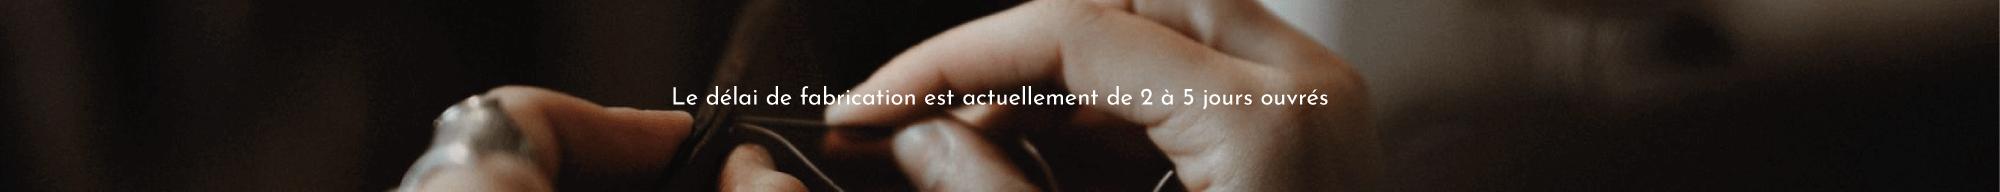 délai-de-fabrication---maroquinerie-NEPTUUN